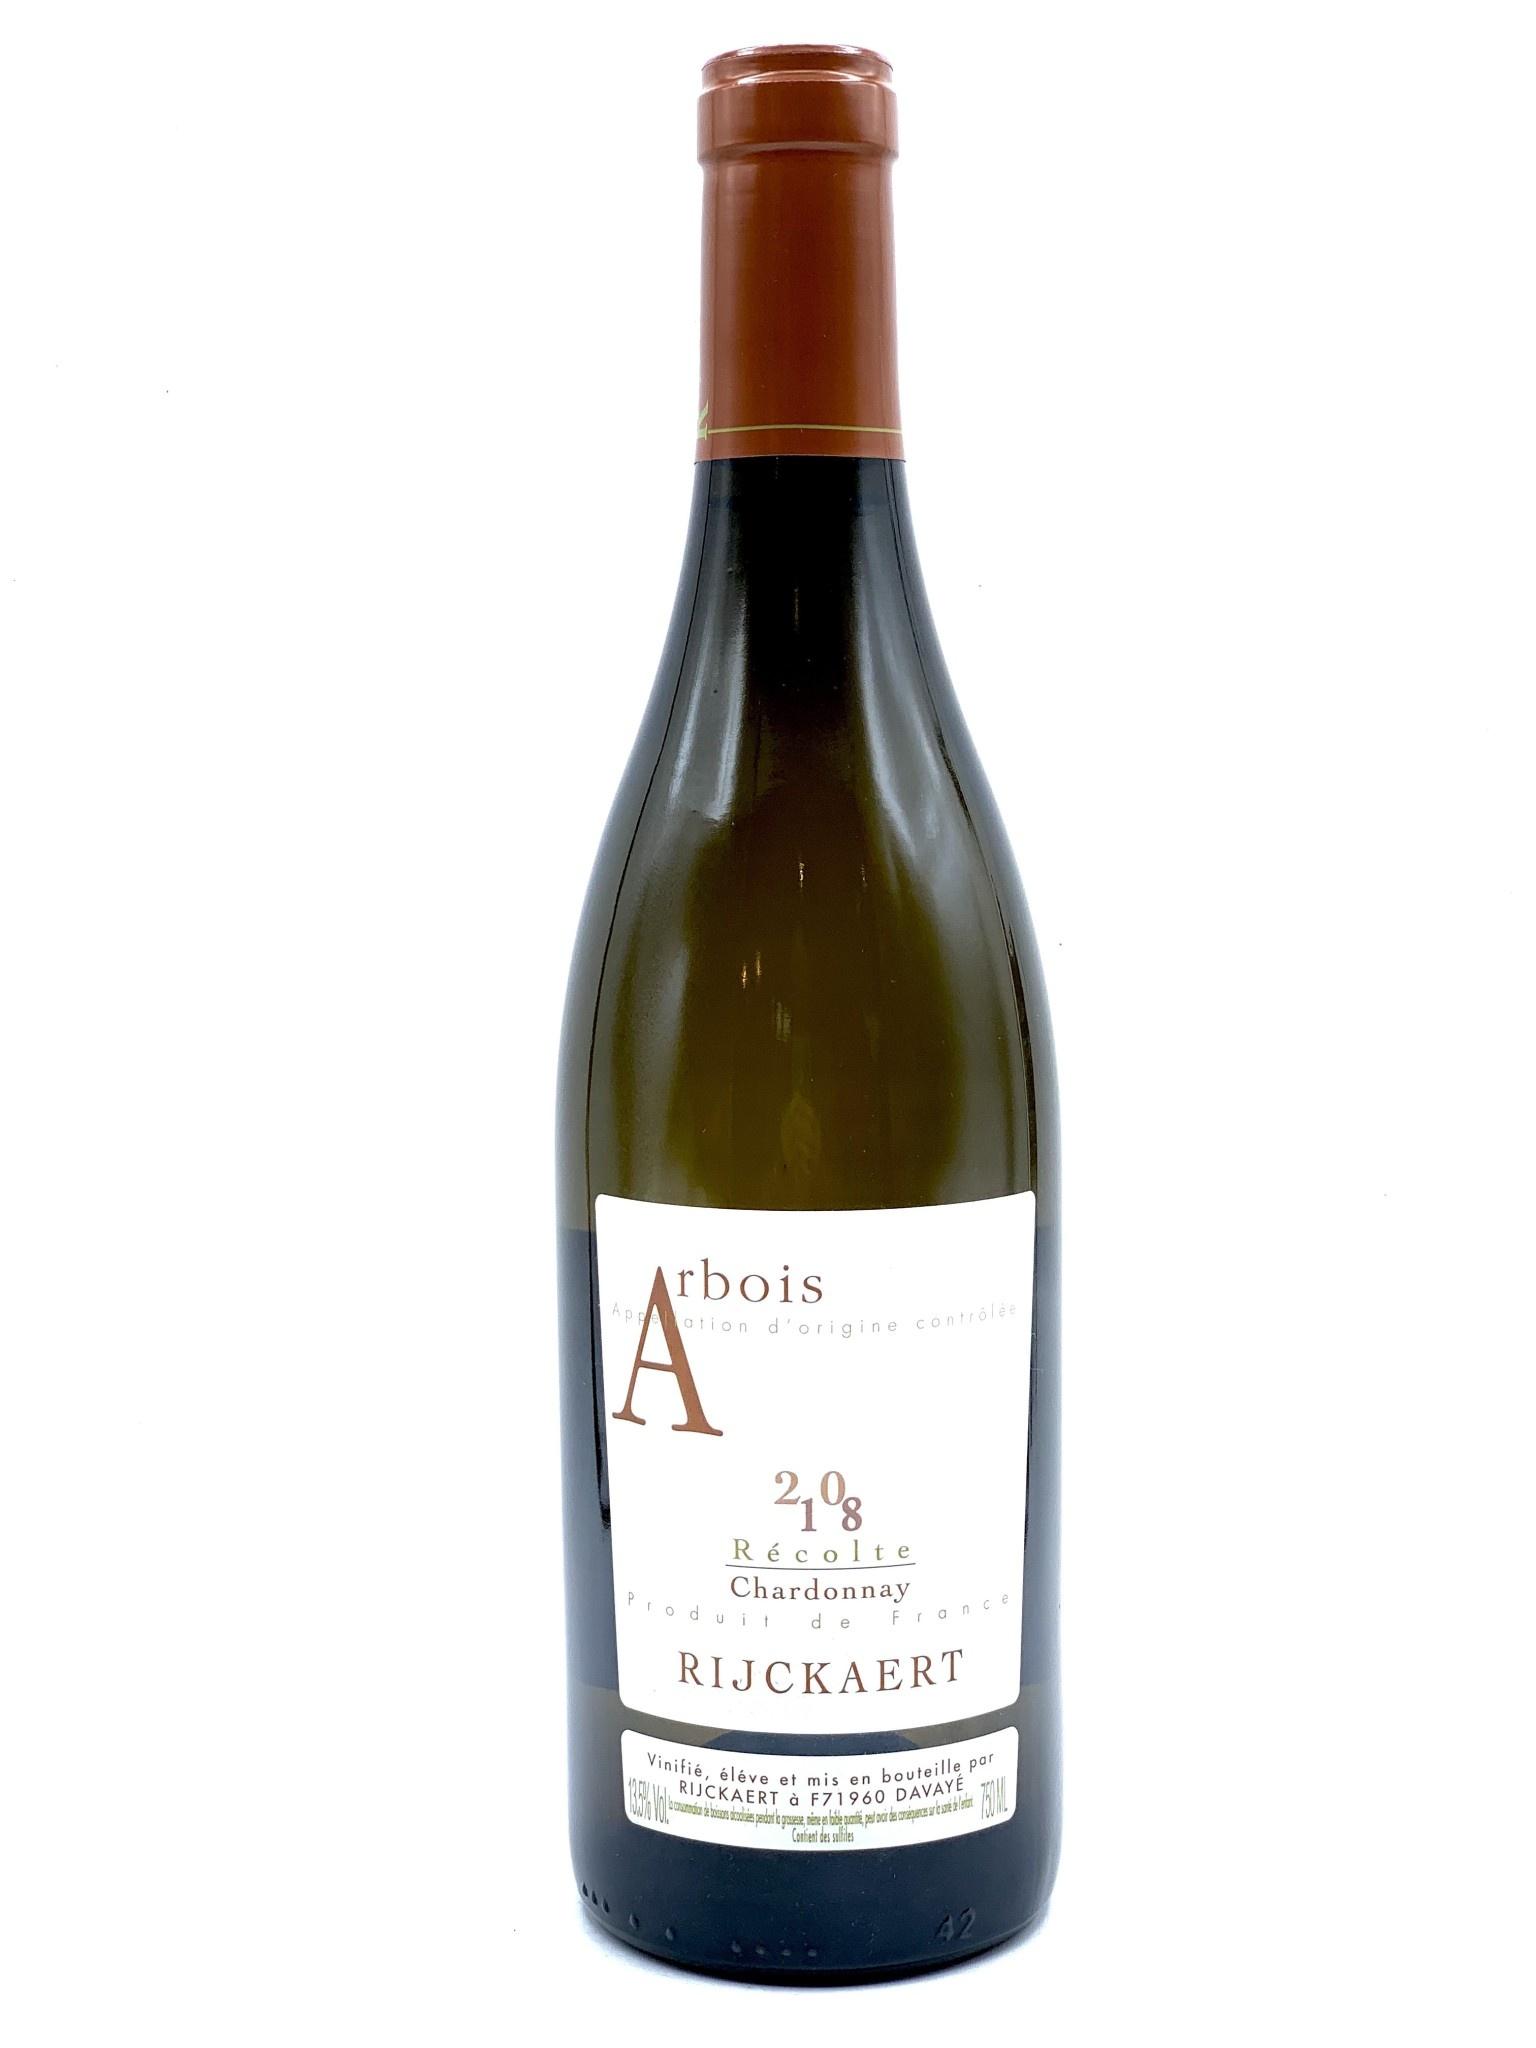 Arbois Chardonnay 2018 Jean Rijckaert  750ml